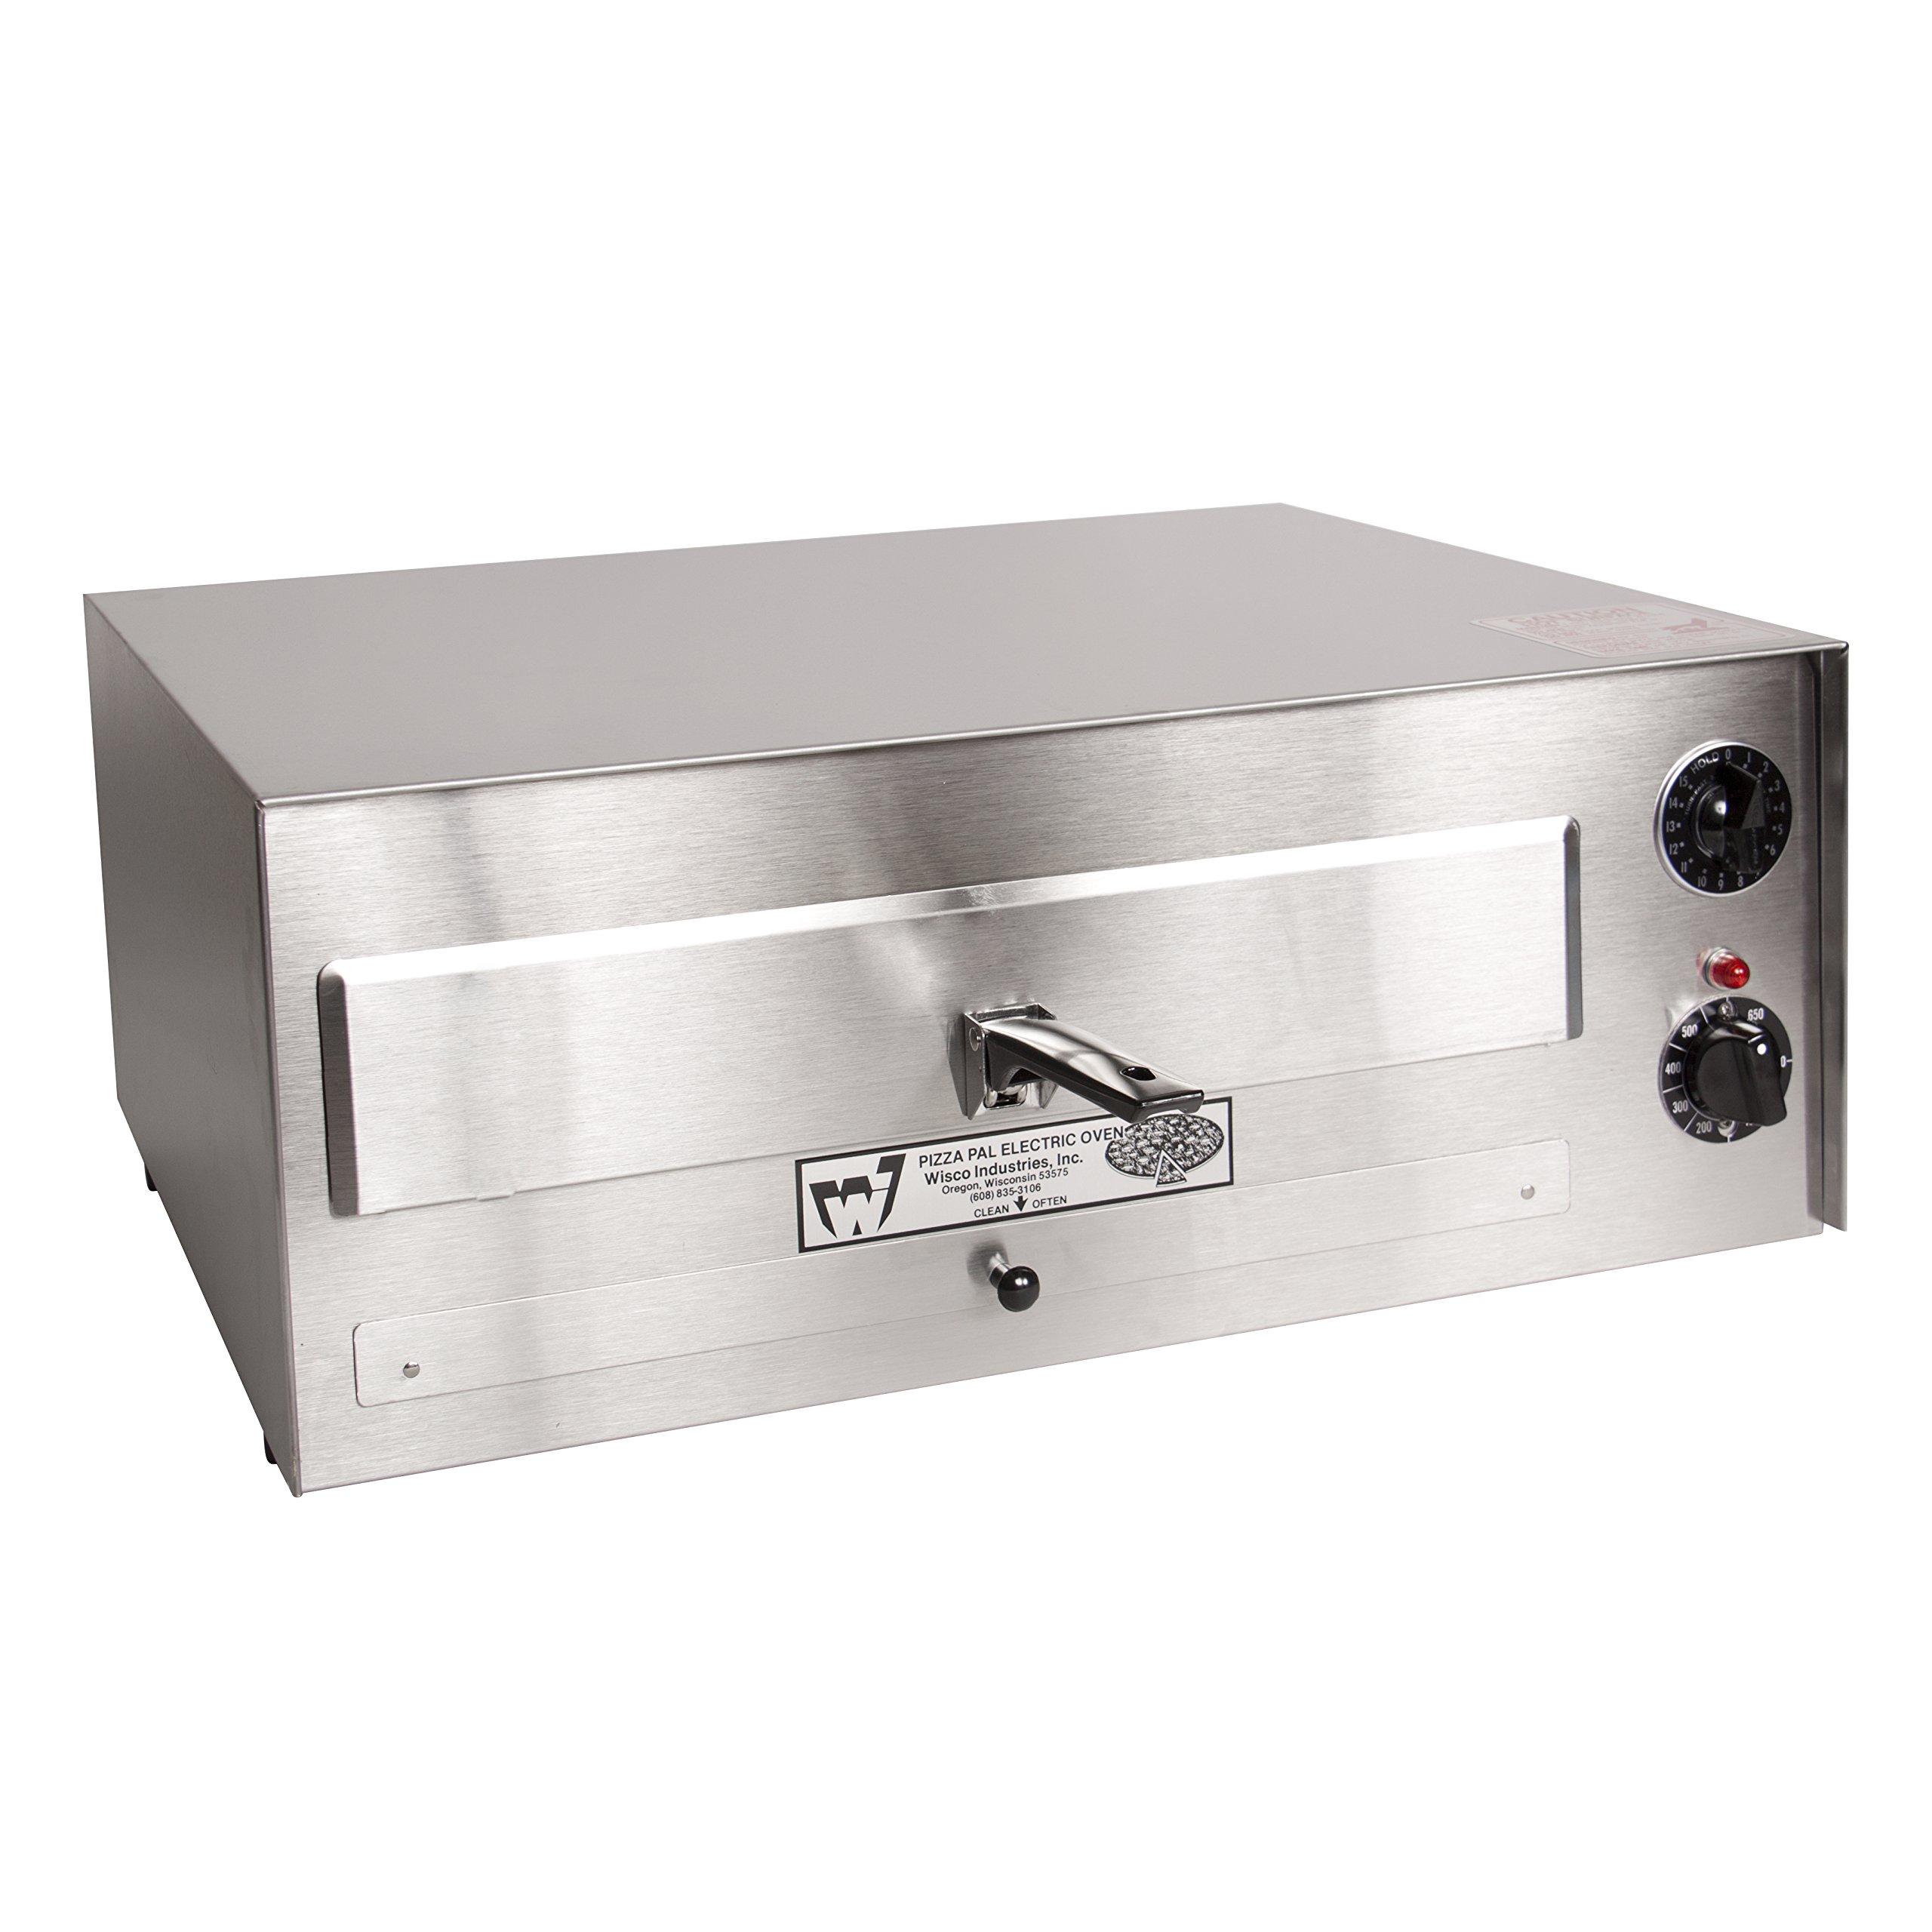 Wisco 560 Pizza Oven, Heavy Duty